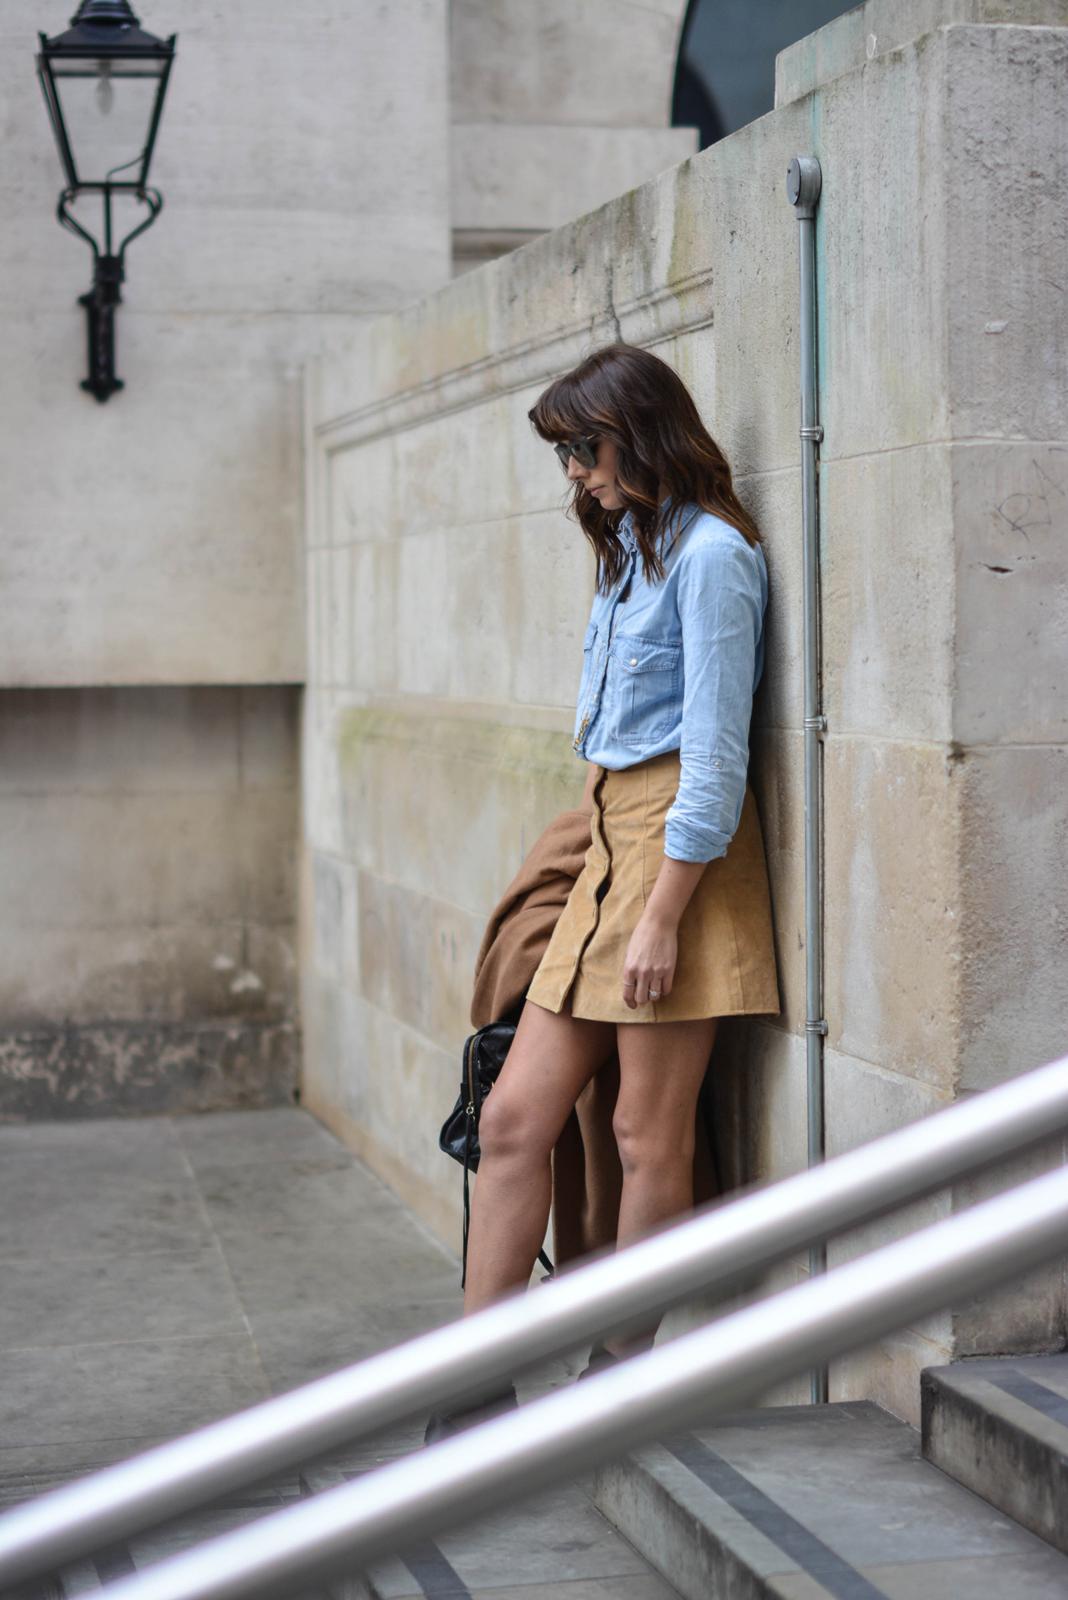 EJSTYLE - Emma Hill, Stella McCartney Sunglasses, denim shirt, camel coat, suede popper skirt miss selfridge, 70s style, street style, OOTD